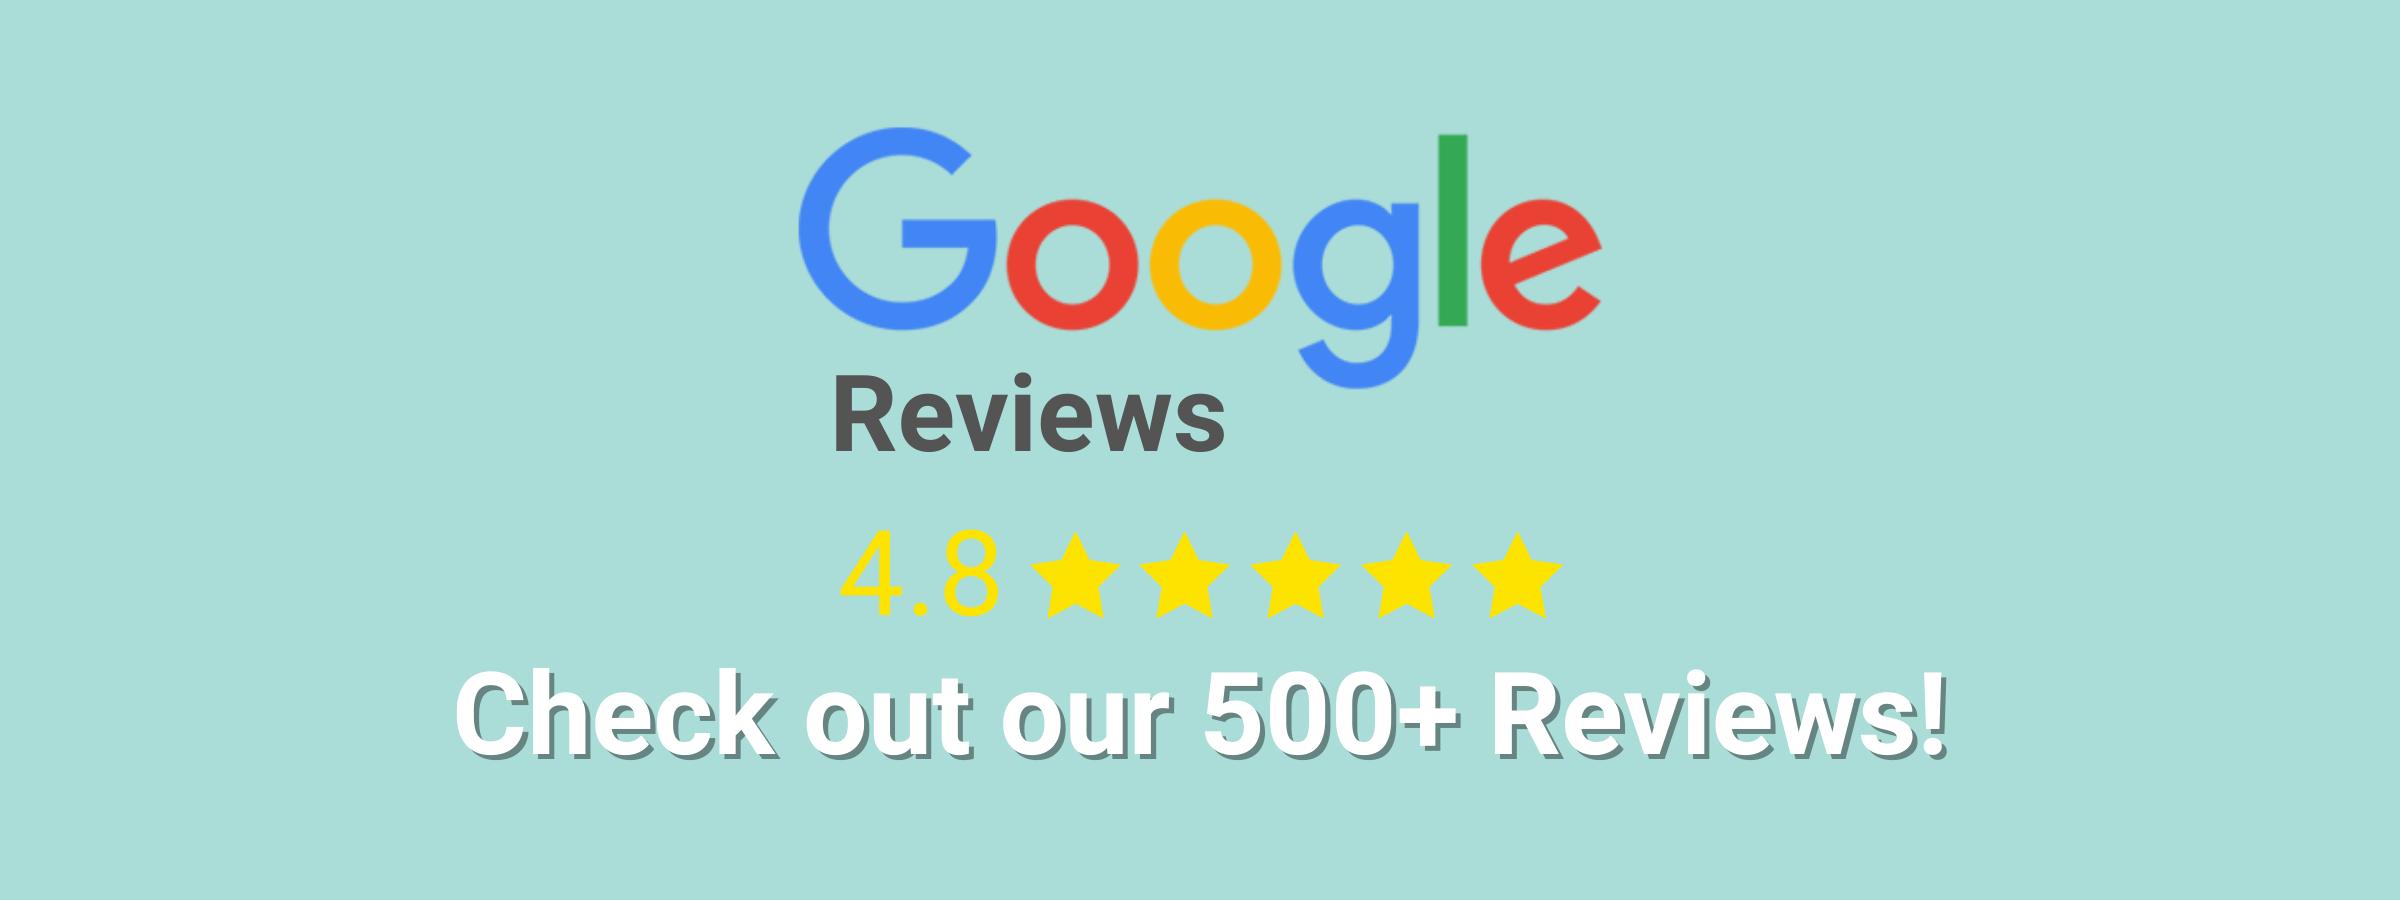 Google reviews 4.8 star rating used car dealer